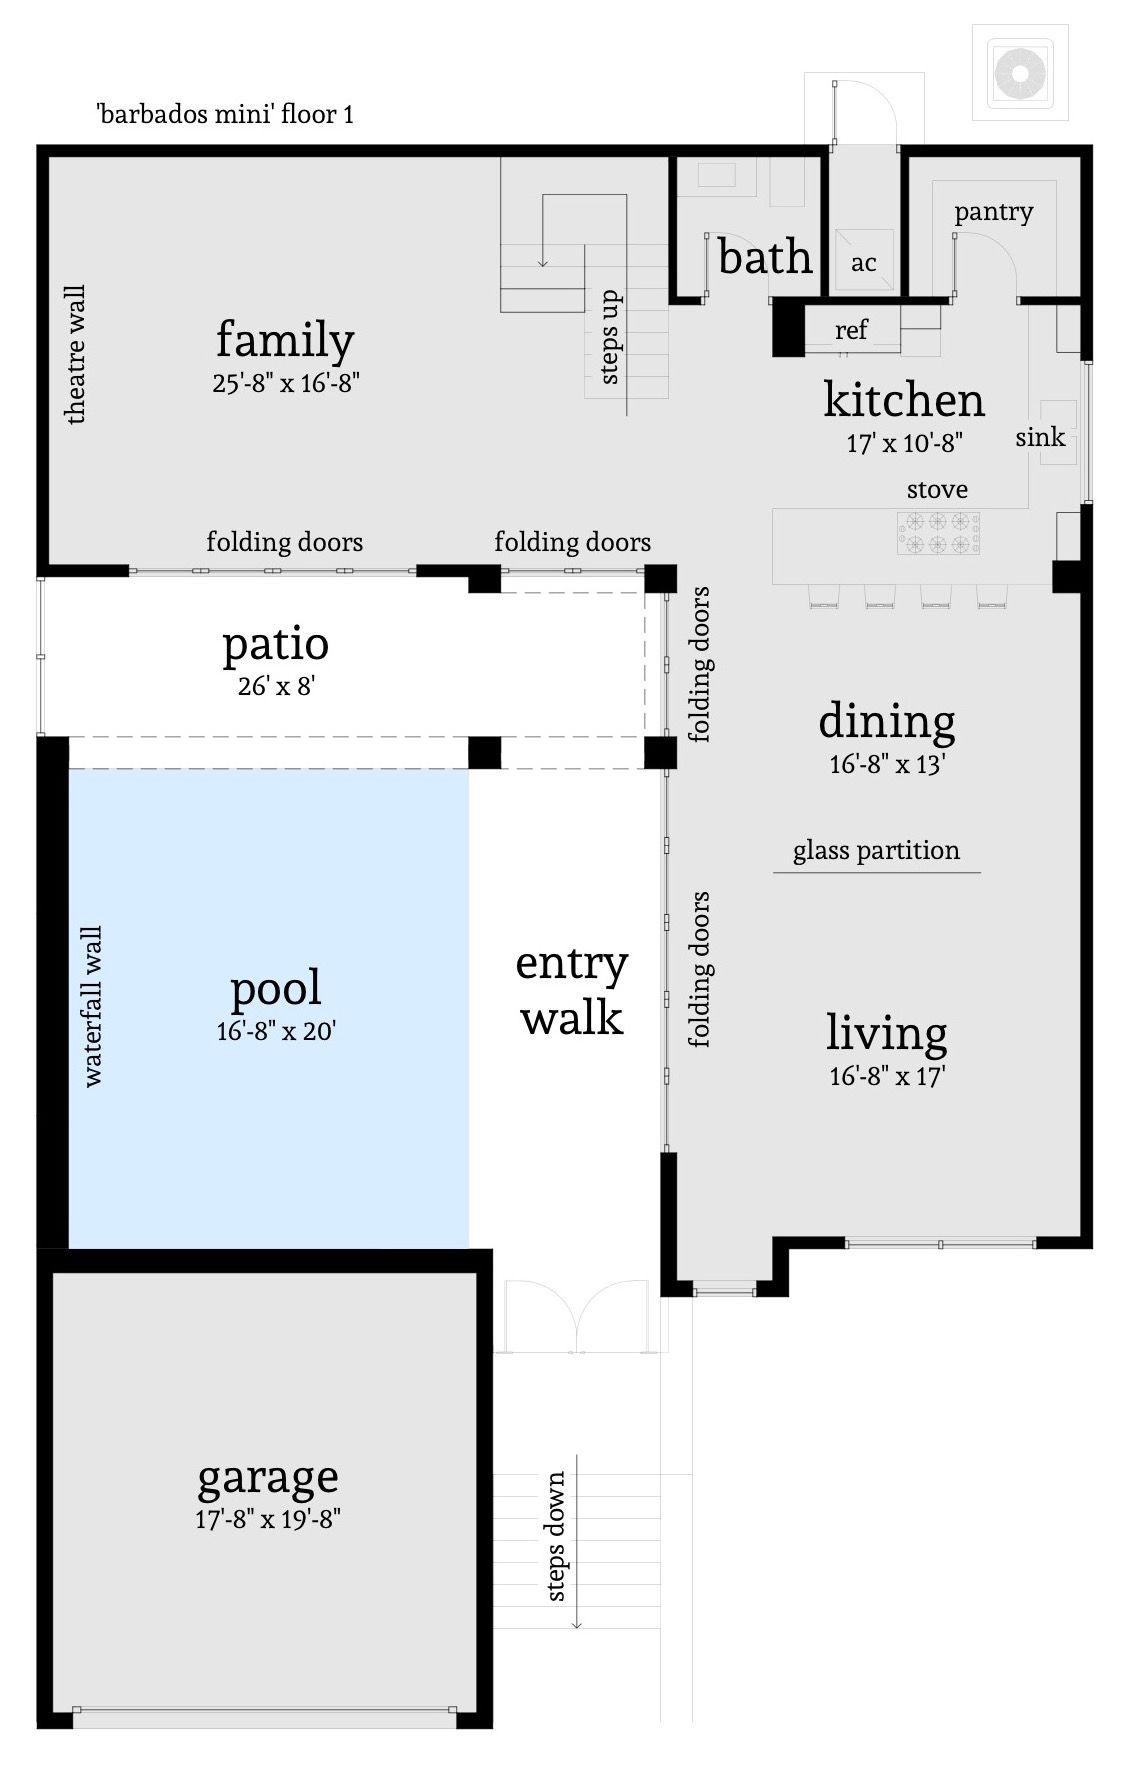 0d4672d61822b77e78532b456c73ed3c Top Result 50 Beautiful Luxury townhouse Floor Plans Image 2017 Zat3